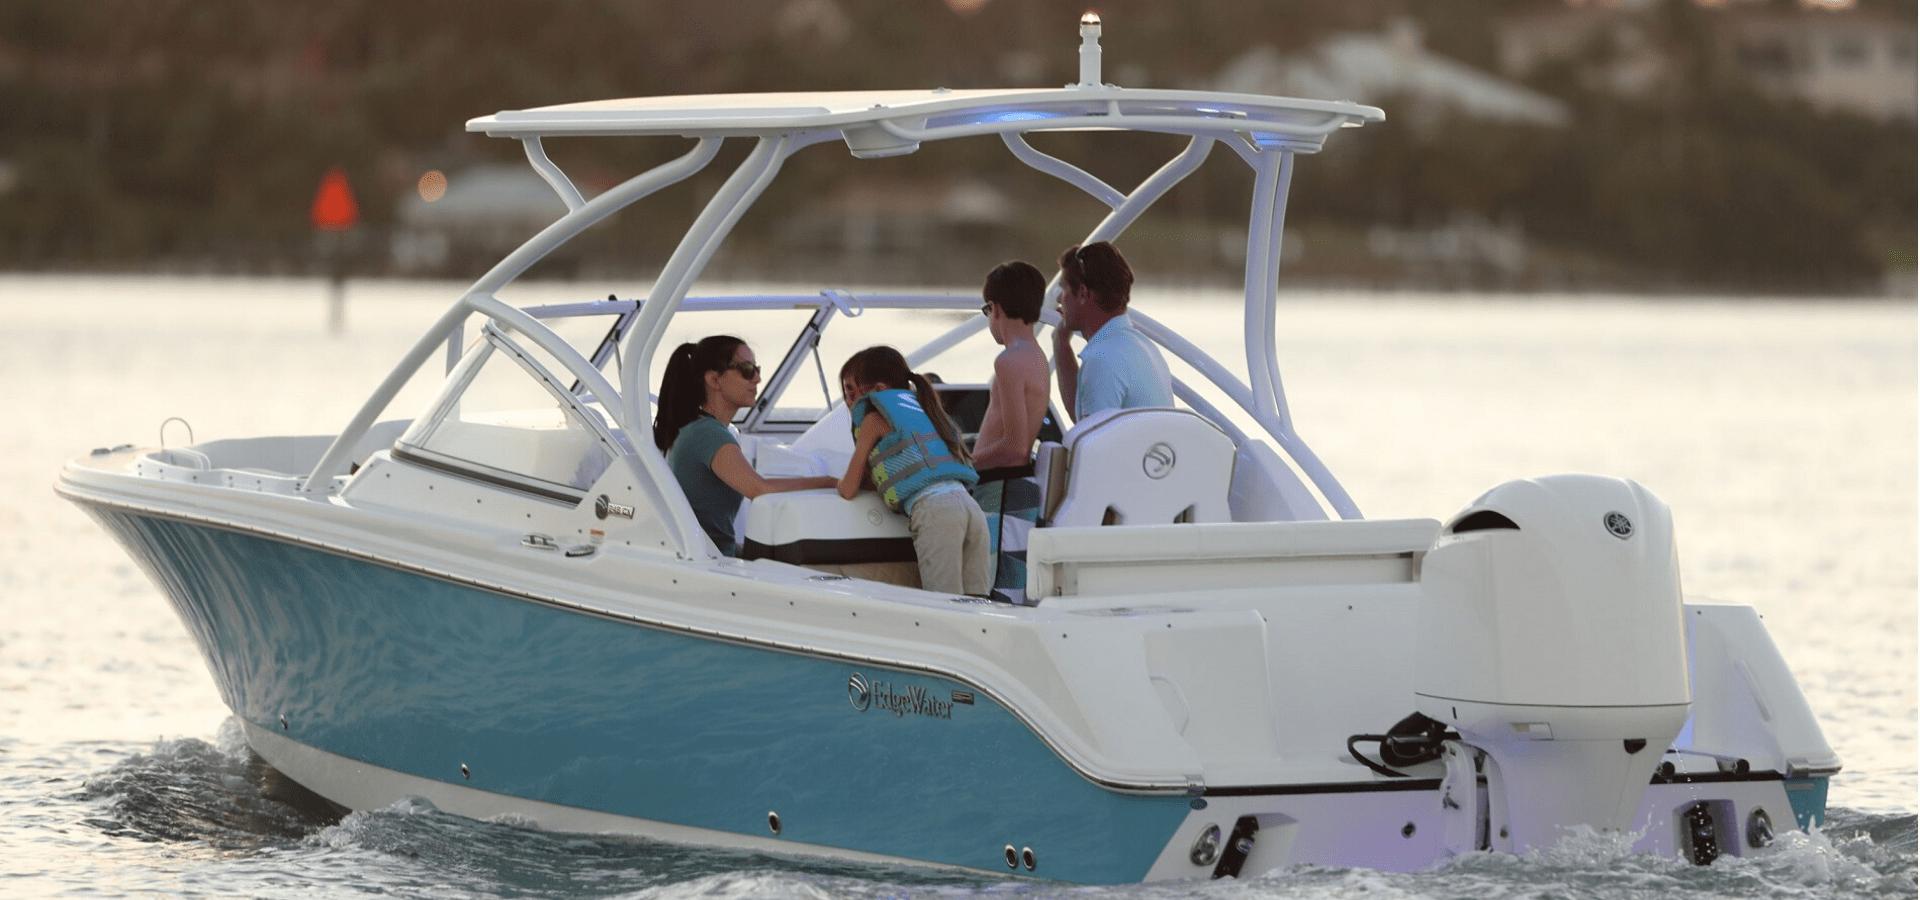 EdgeWater boat